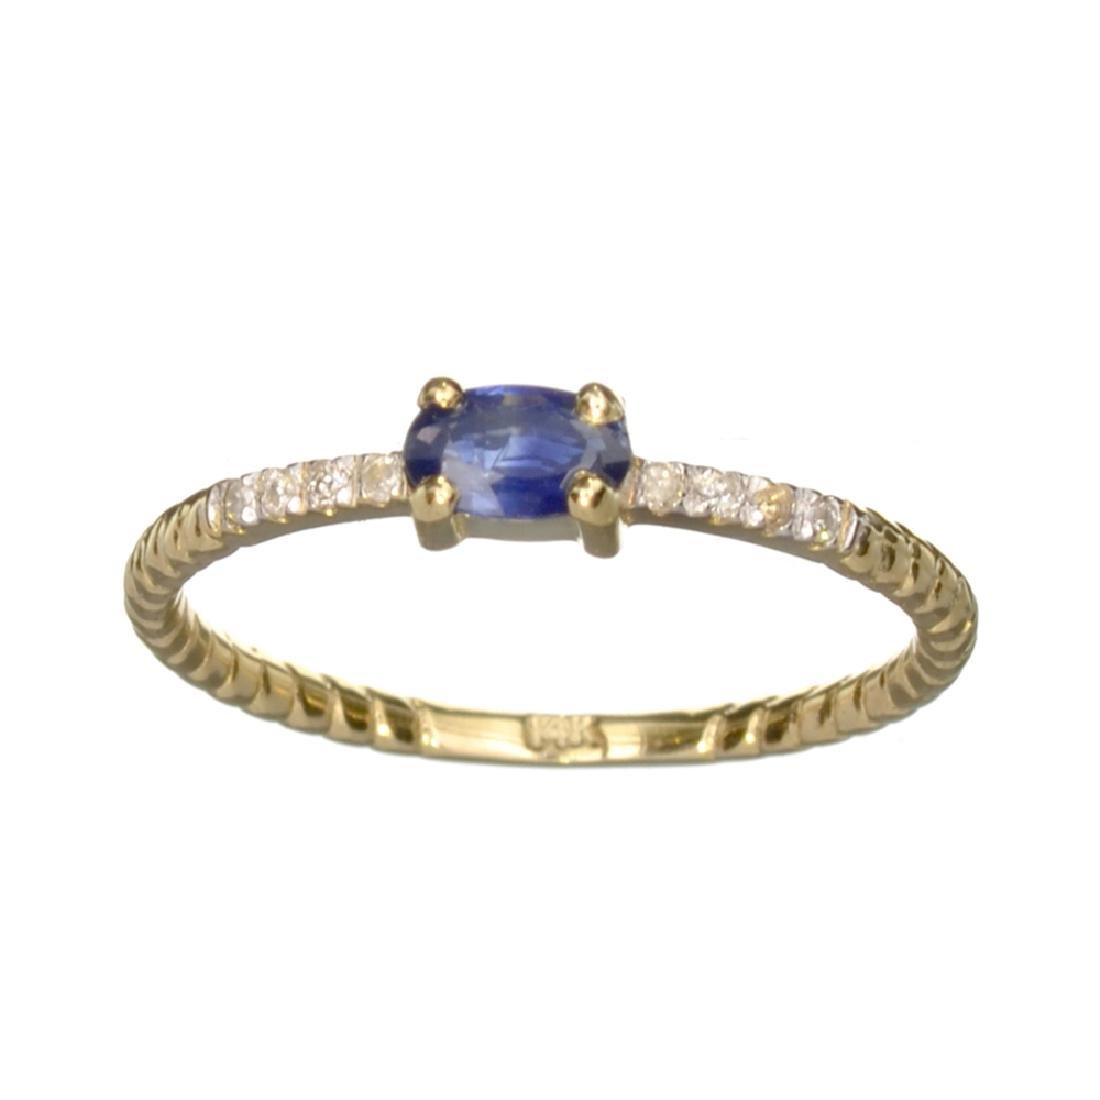 APP: 0.7k Fine Jewelry 14KT Gold, 0.28CT Blue Sapphire